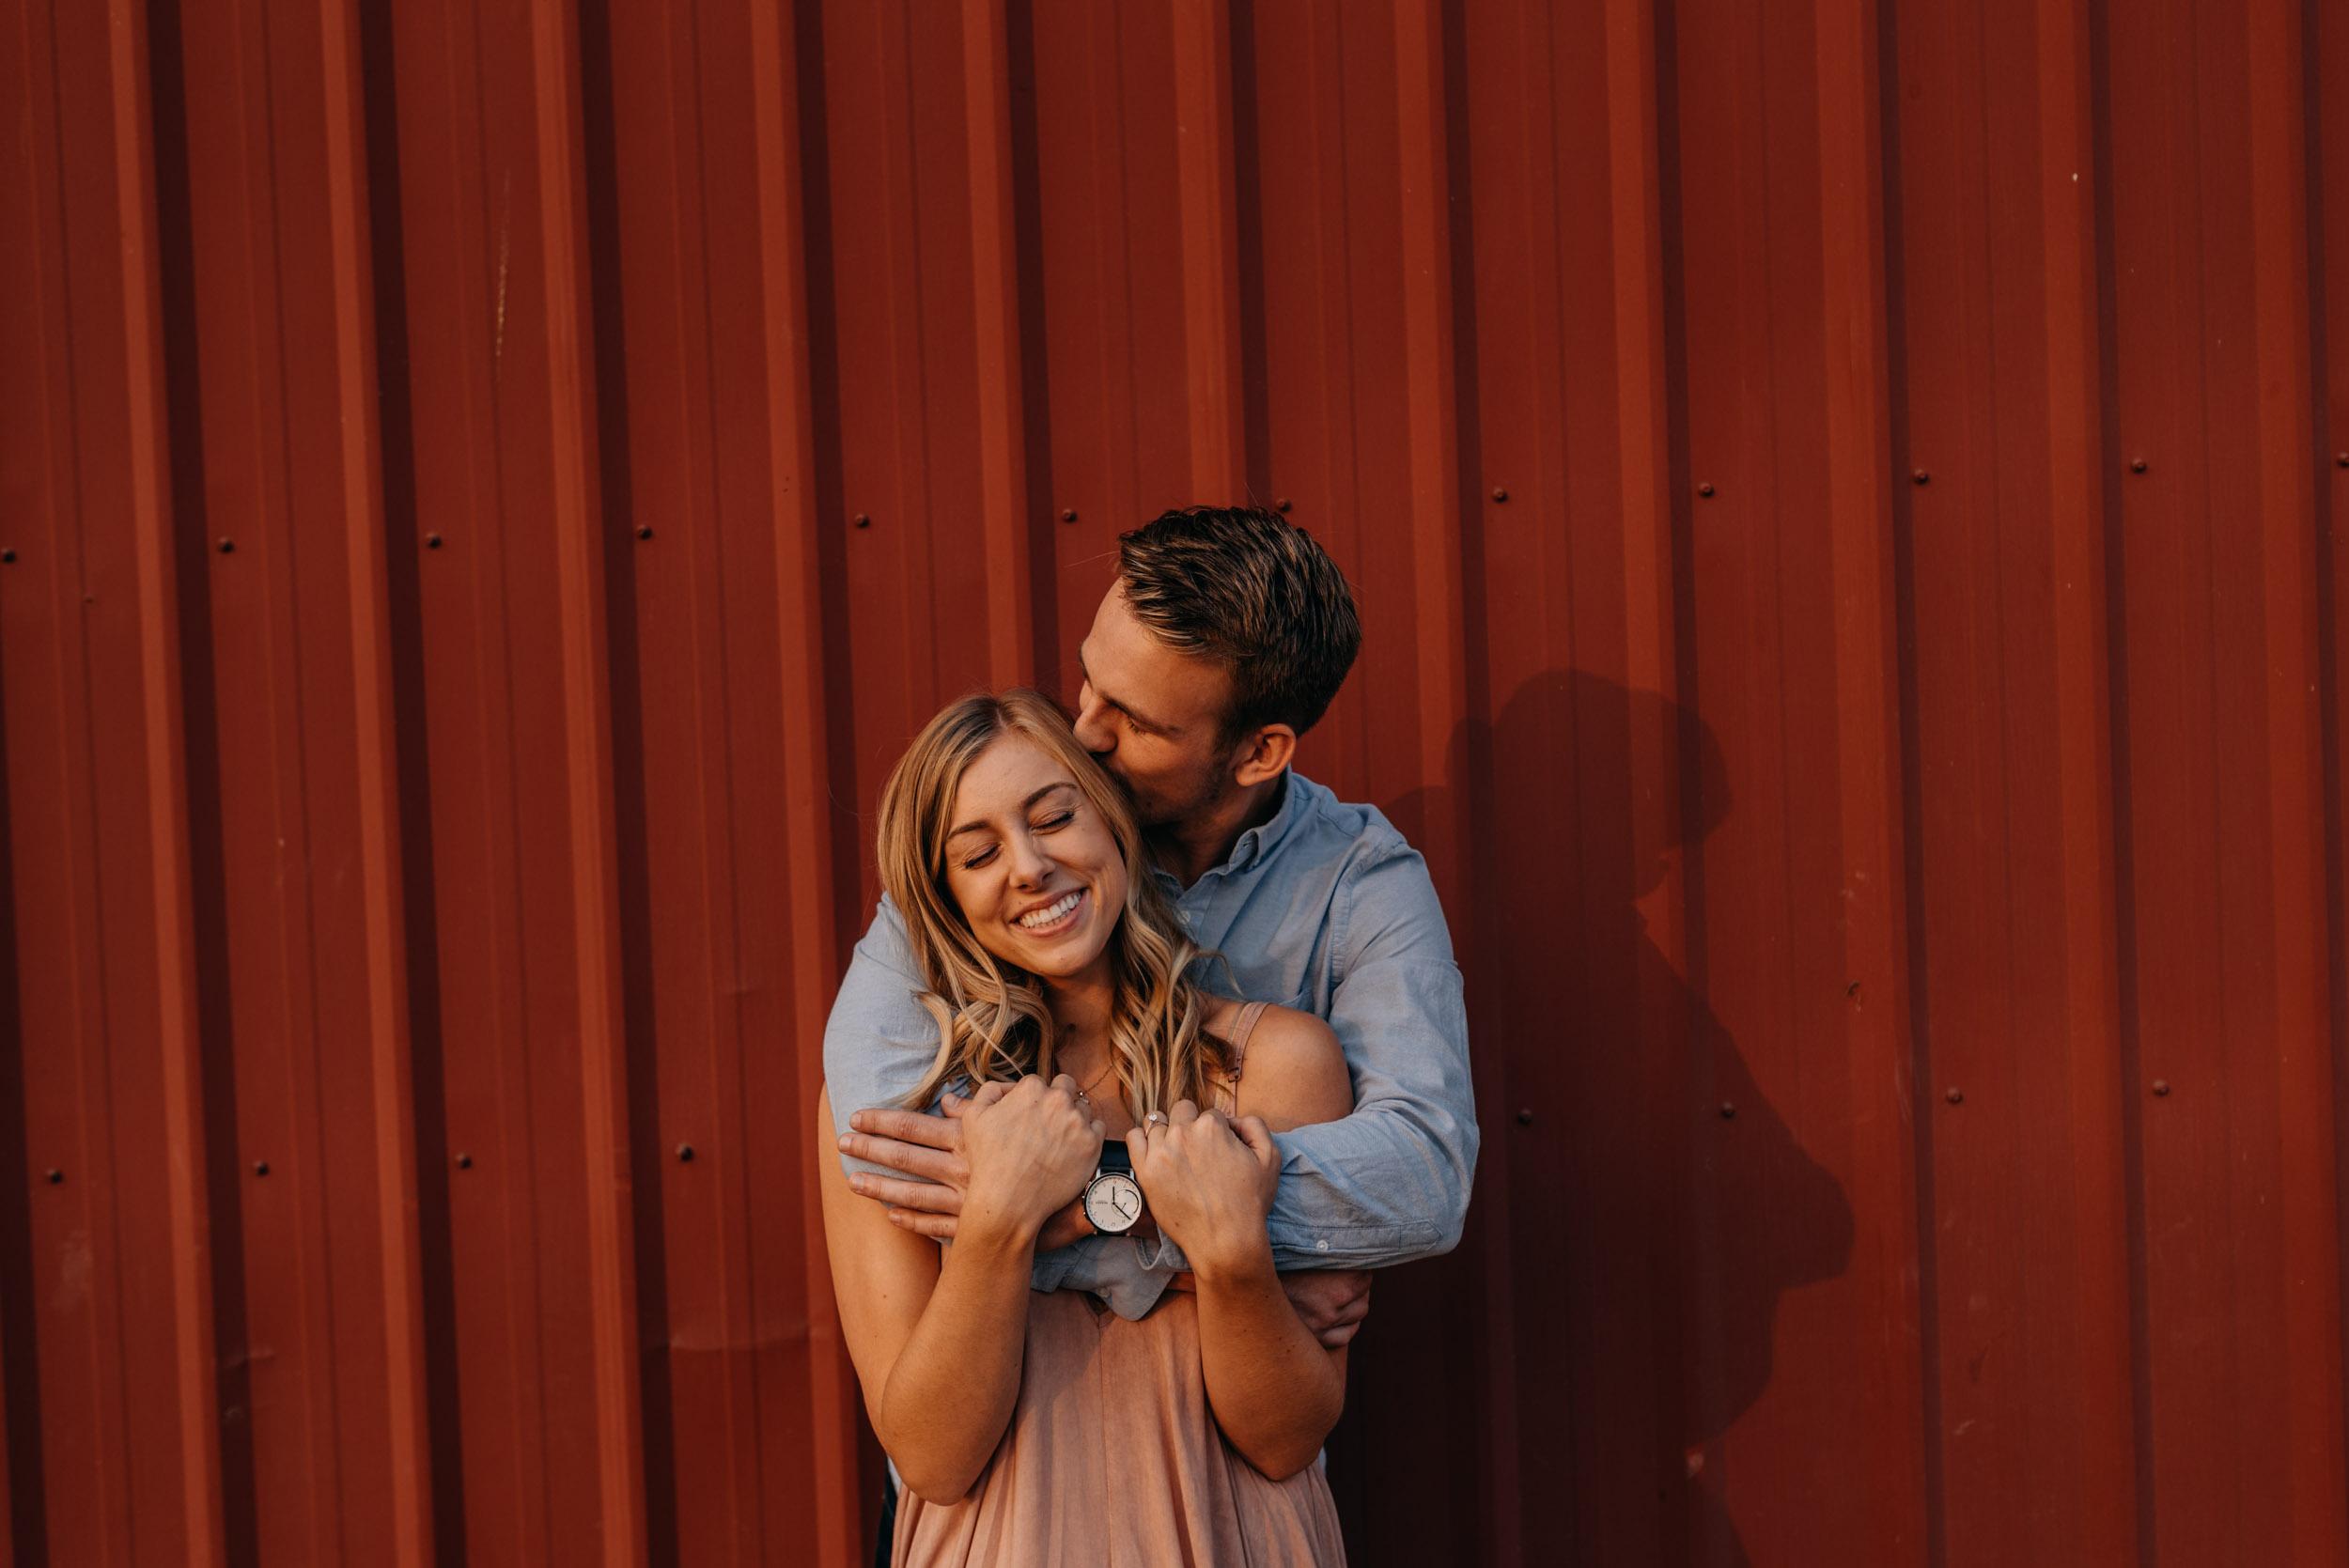 Oregon-Red-Barn-Door-Engagement-Sauvie-3490.jpg